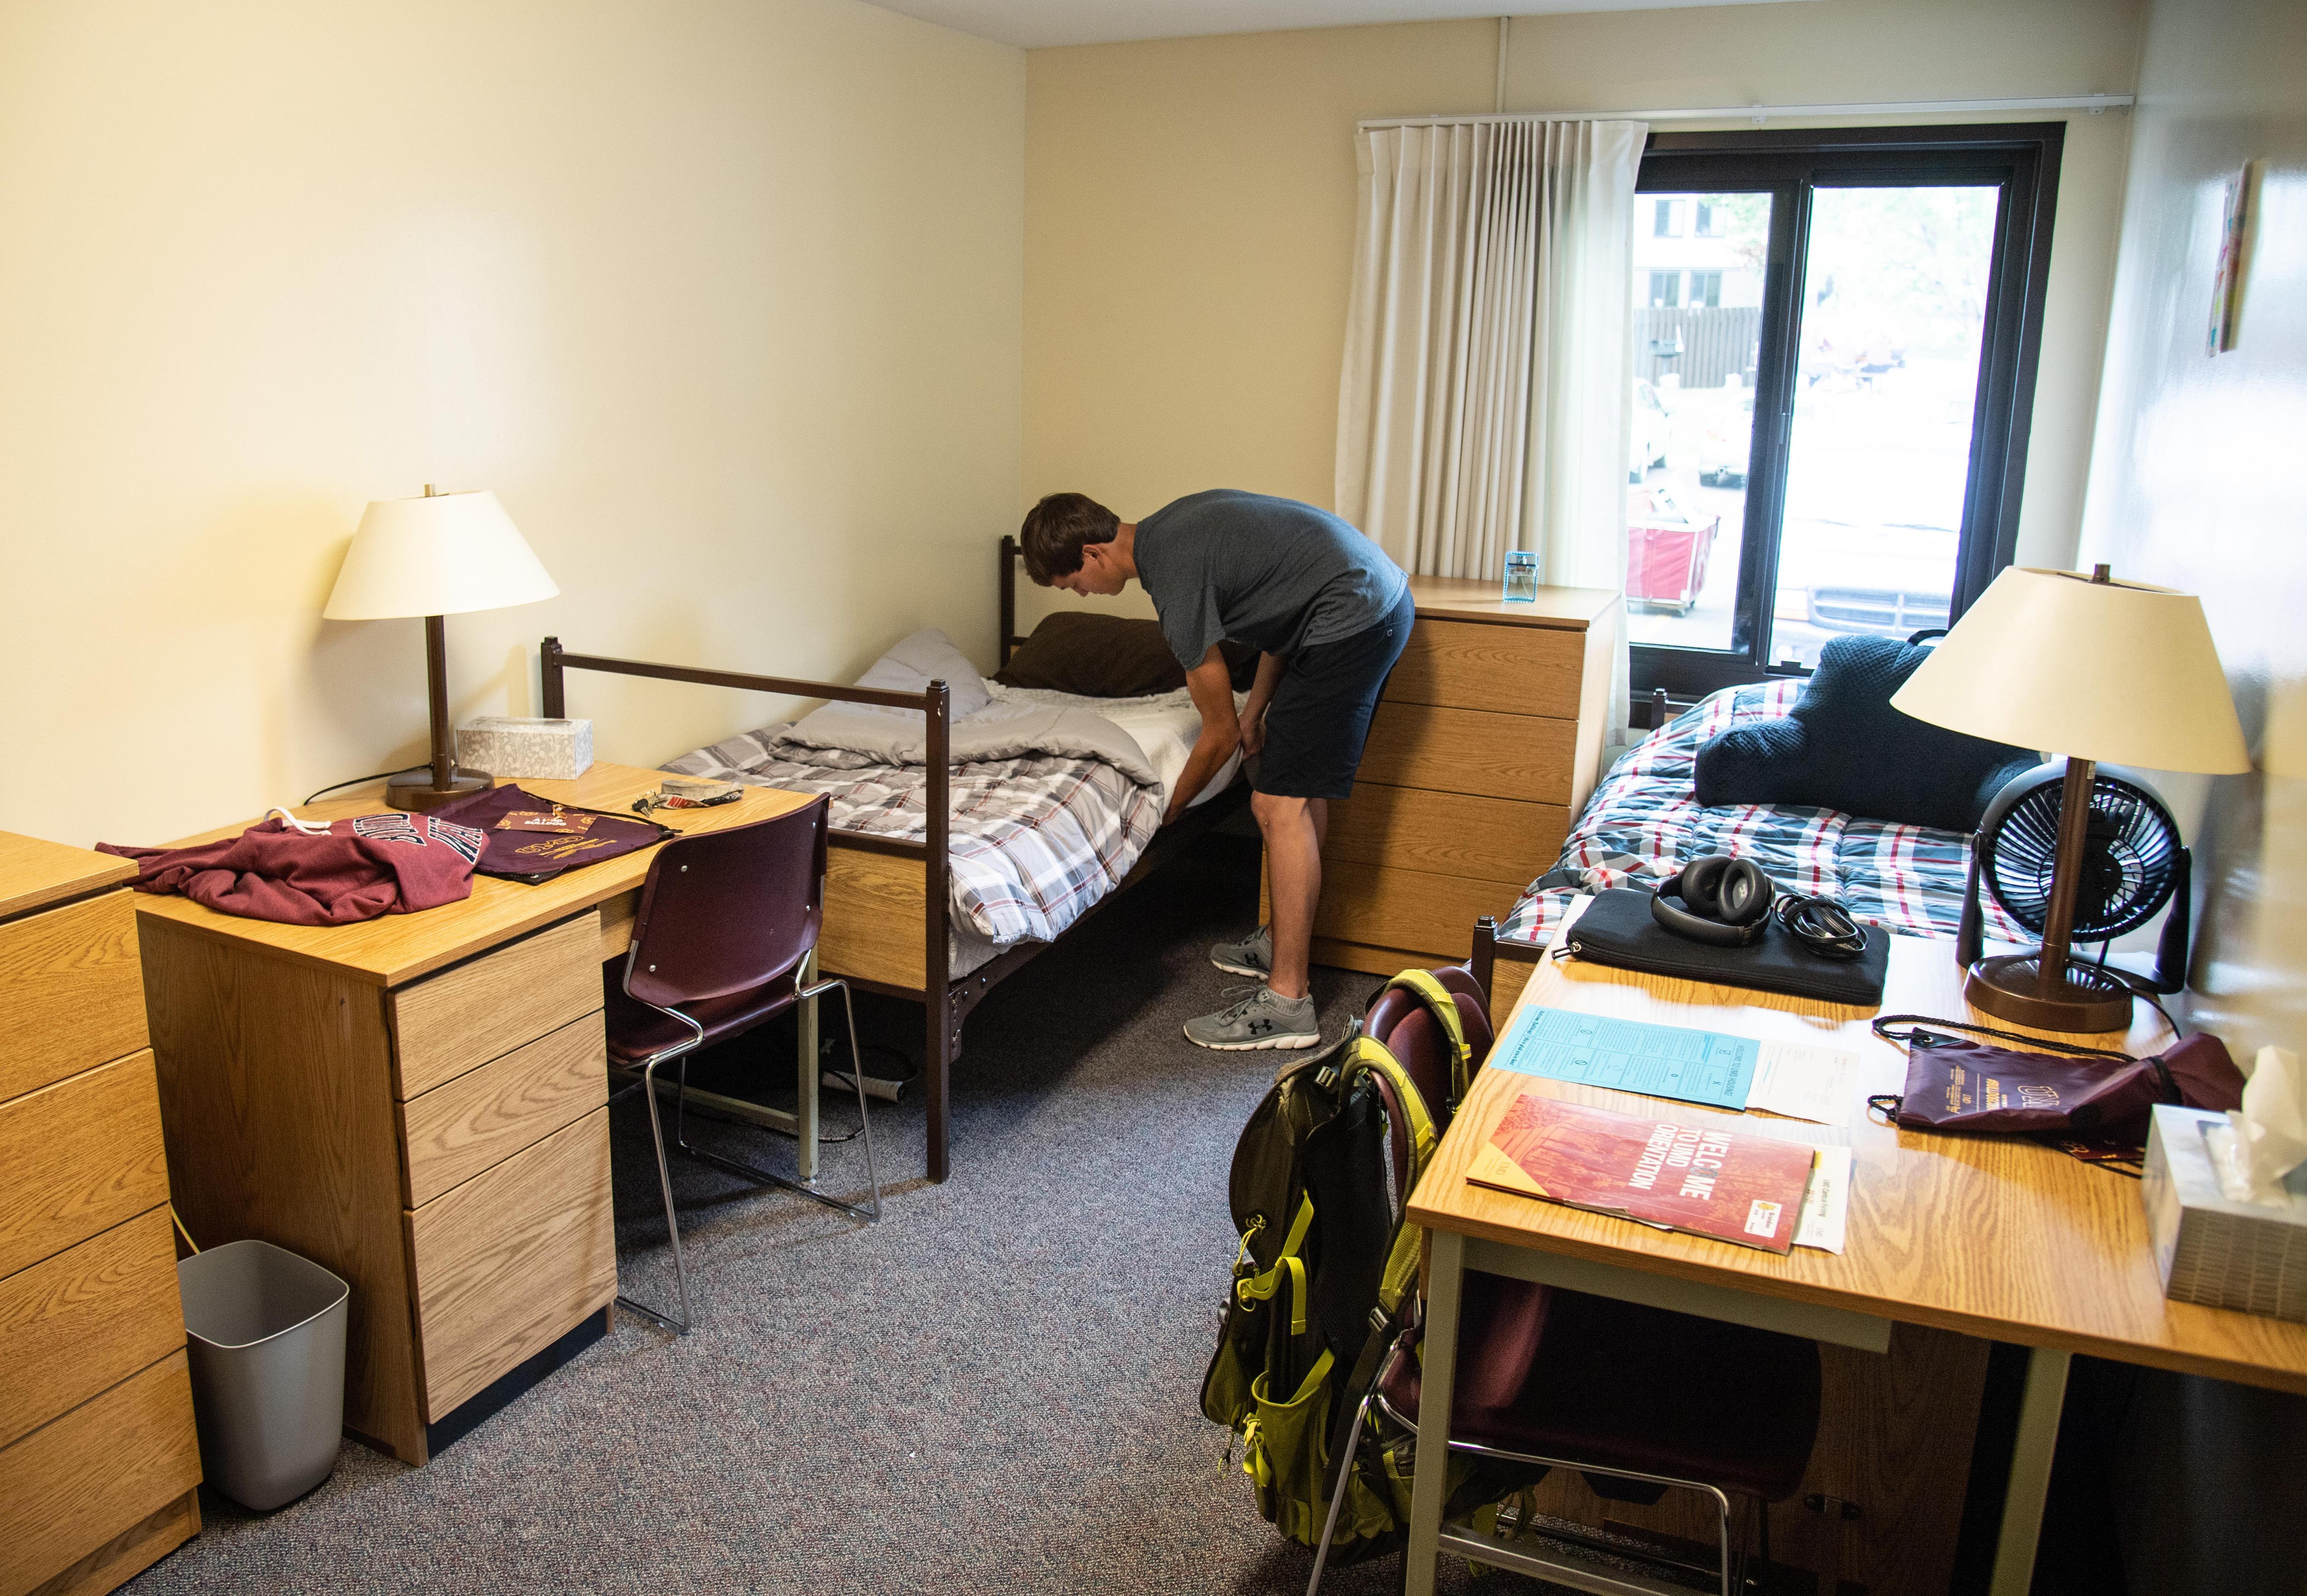 Freshman Robbie moving into his dorm